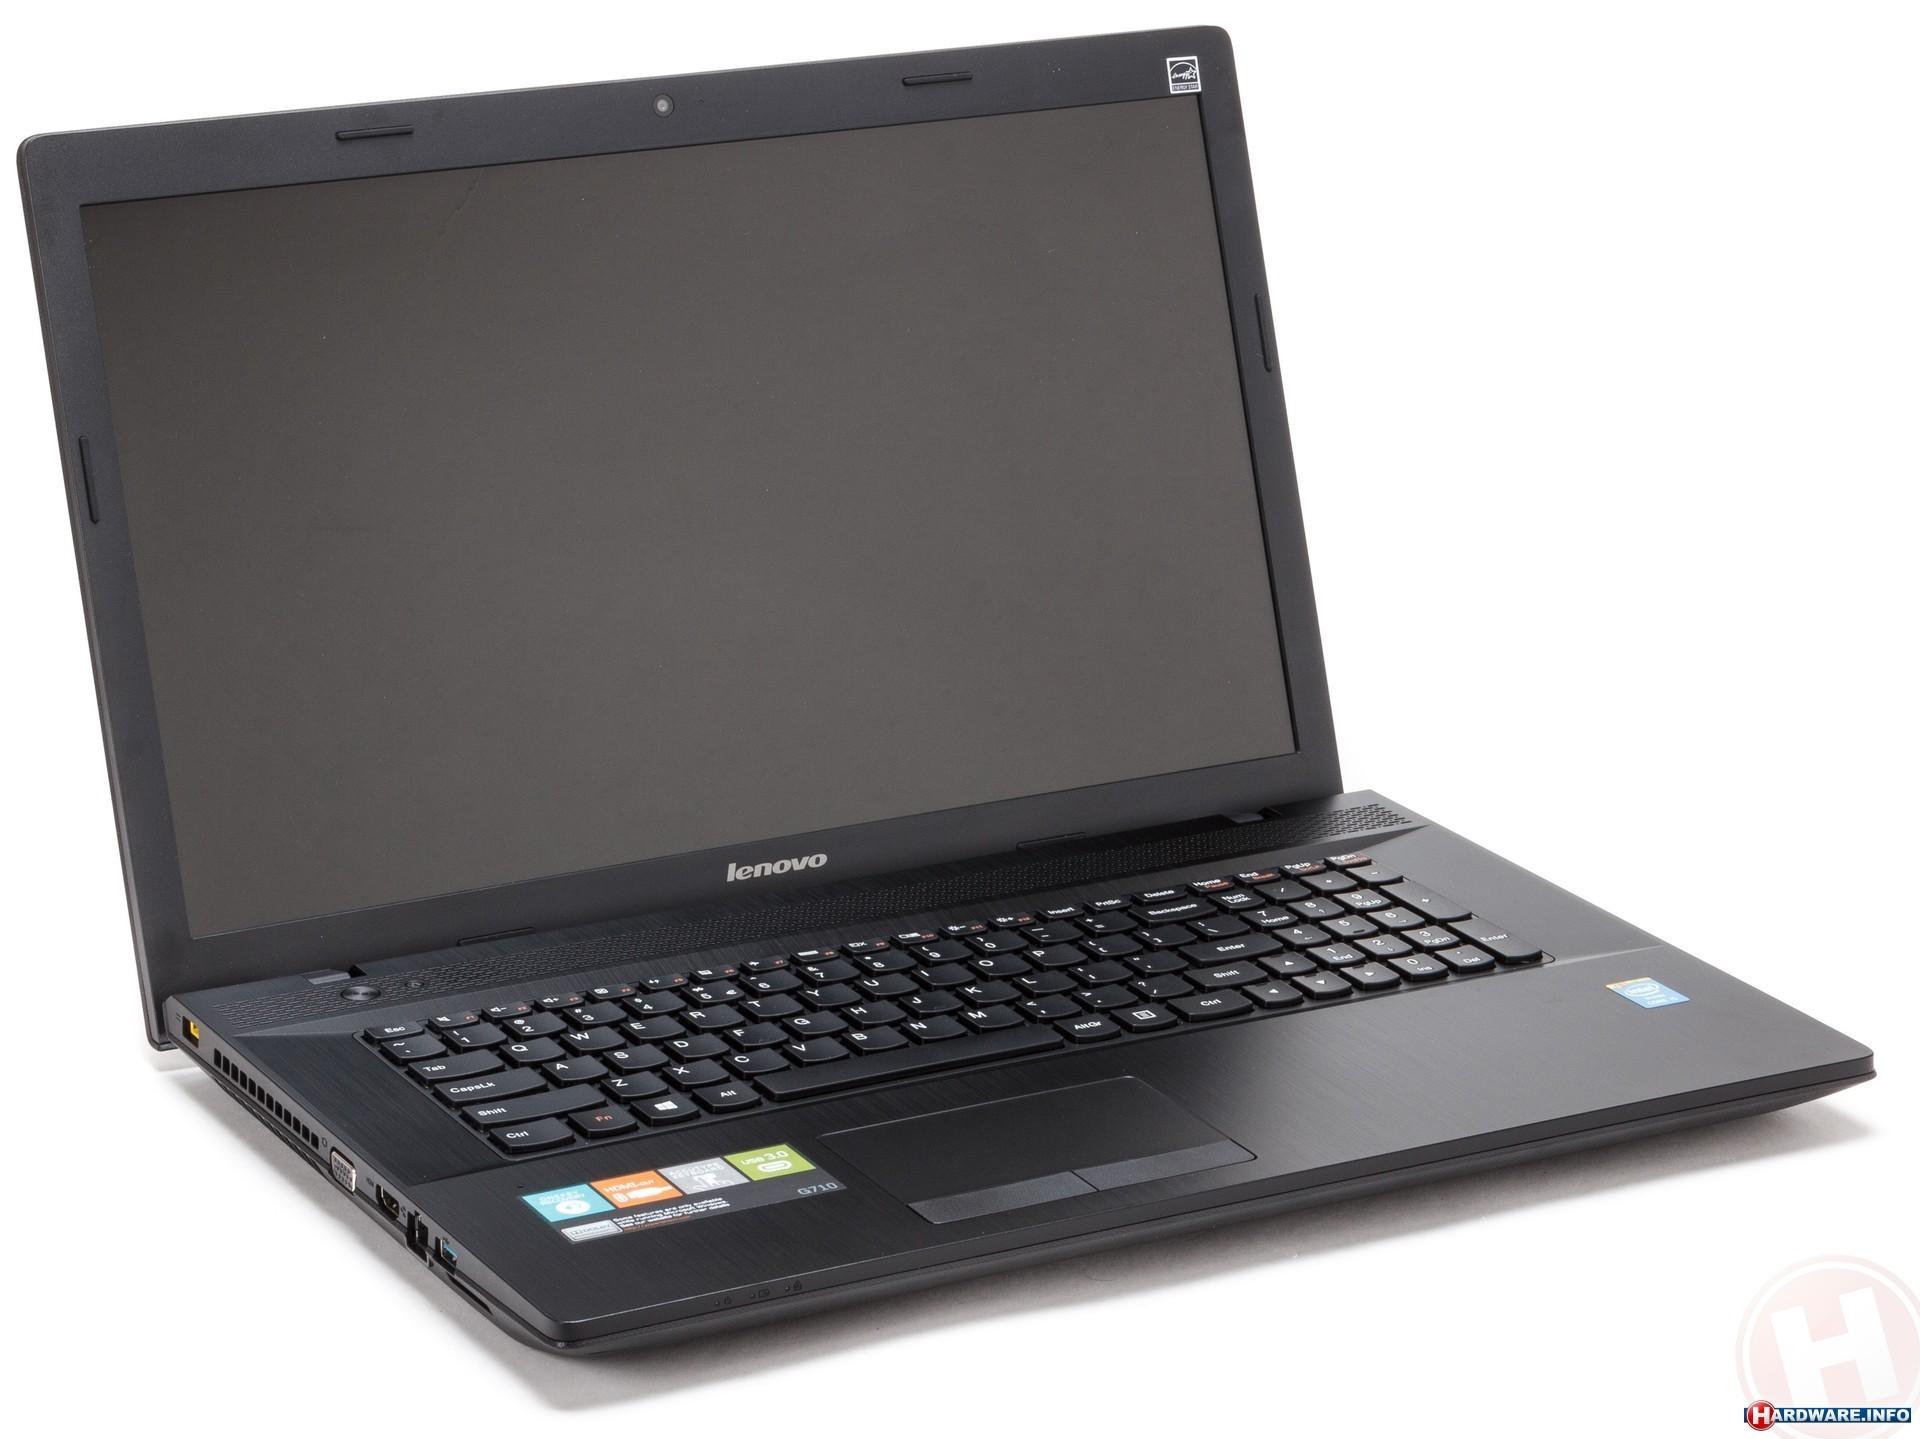 Lenovo Ideapad G710 передний вид